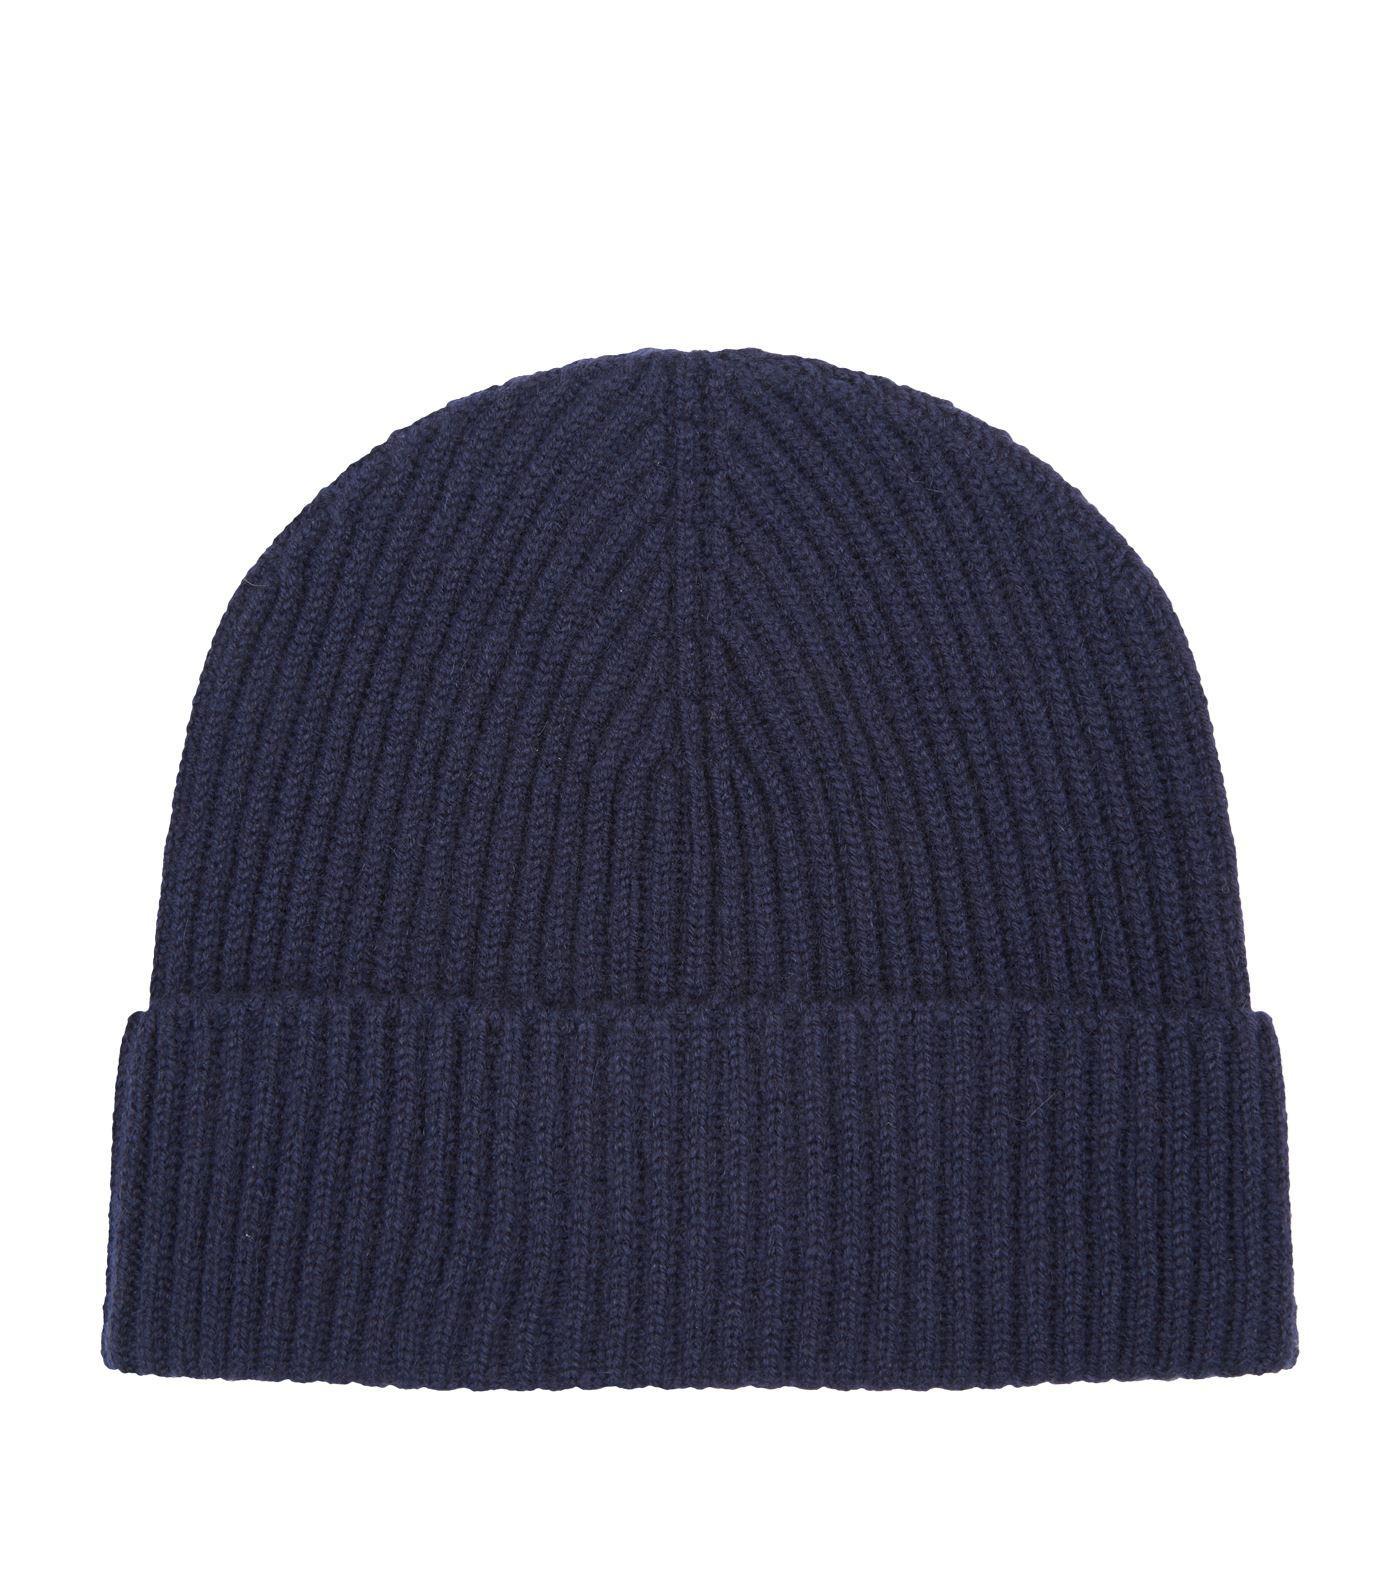 4274800449b Lyst - Harrods Cashmere Beanie Hat in Blue for Men